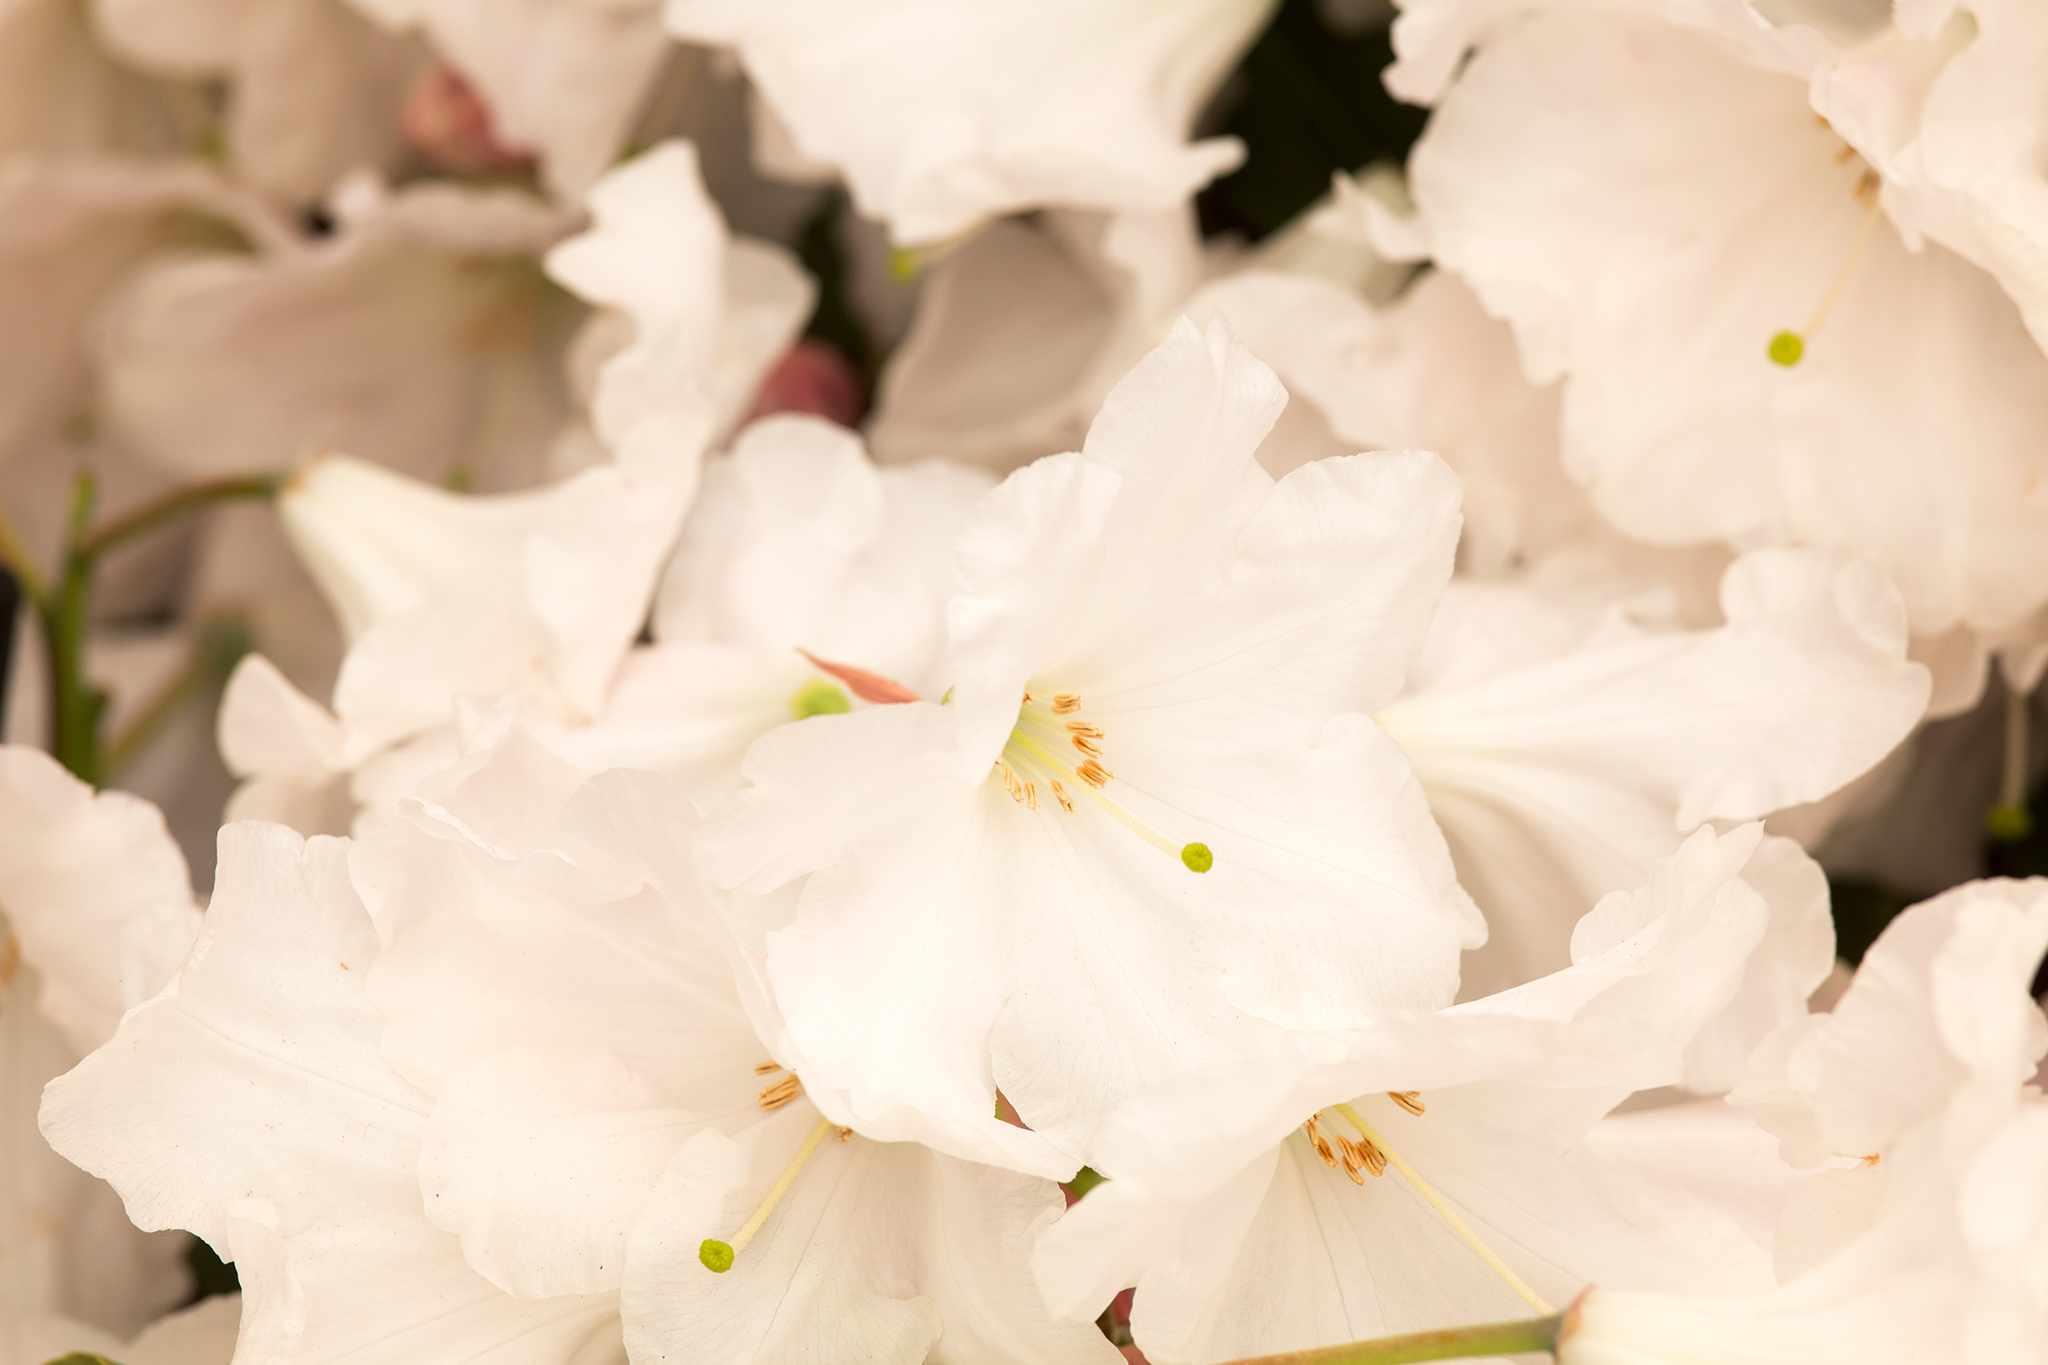 Rhododendron 'Loderi Venus'